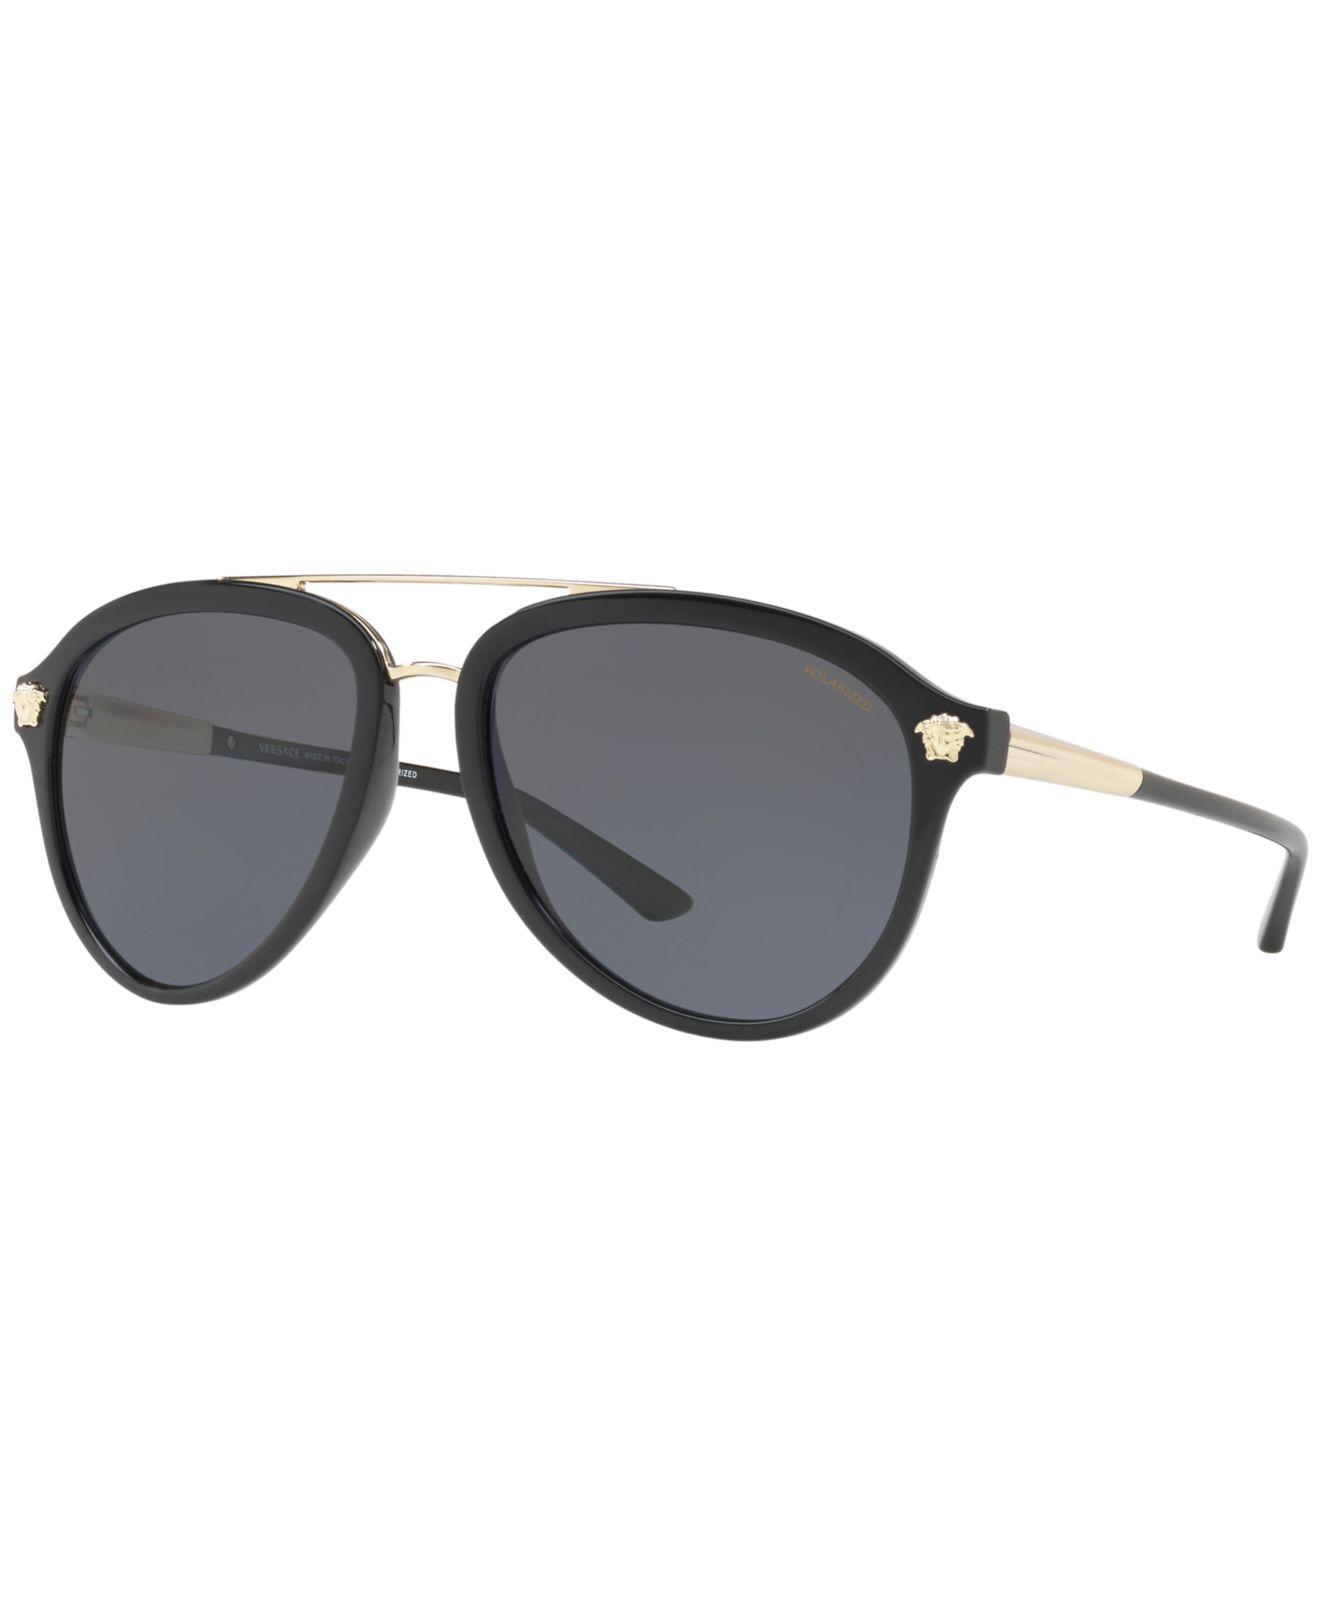 c4e4cf44c70f Versace Gray Sunglasses, Ve4341 for men. View fullscreen